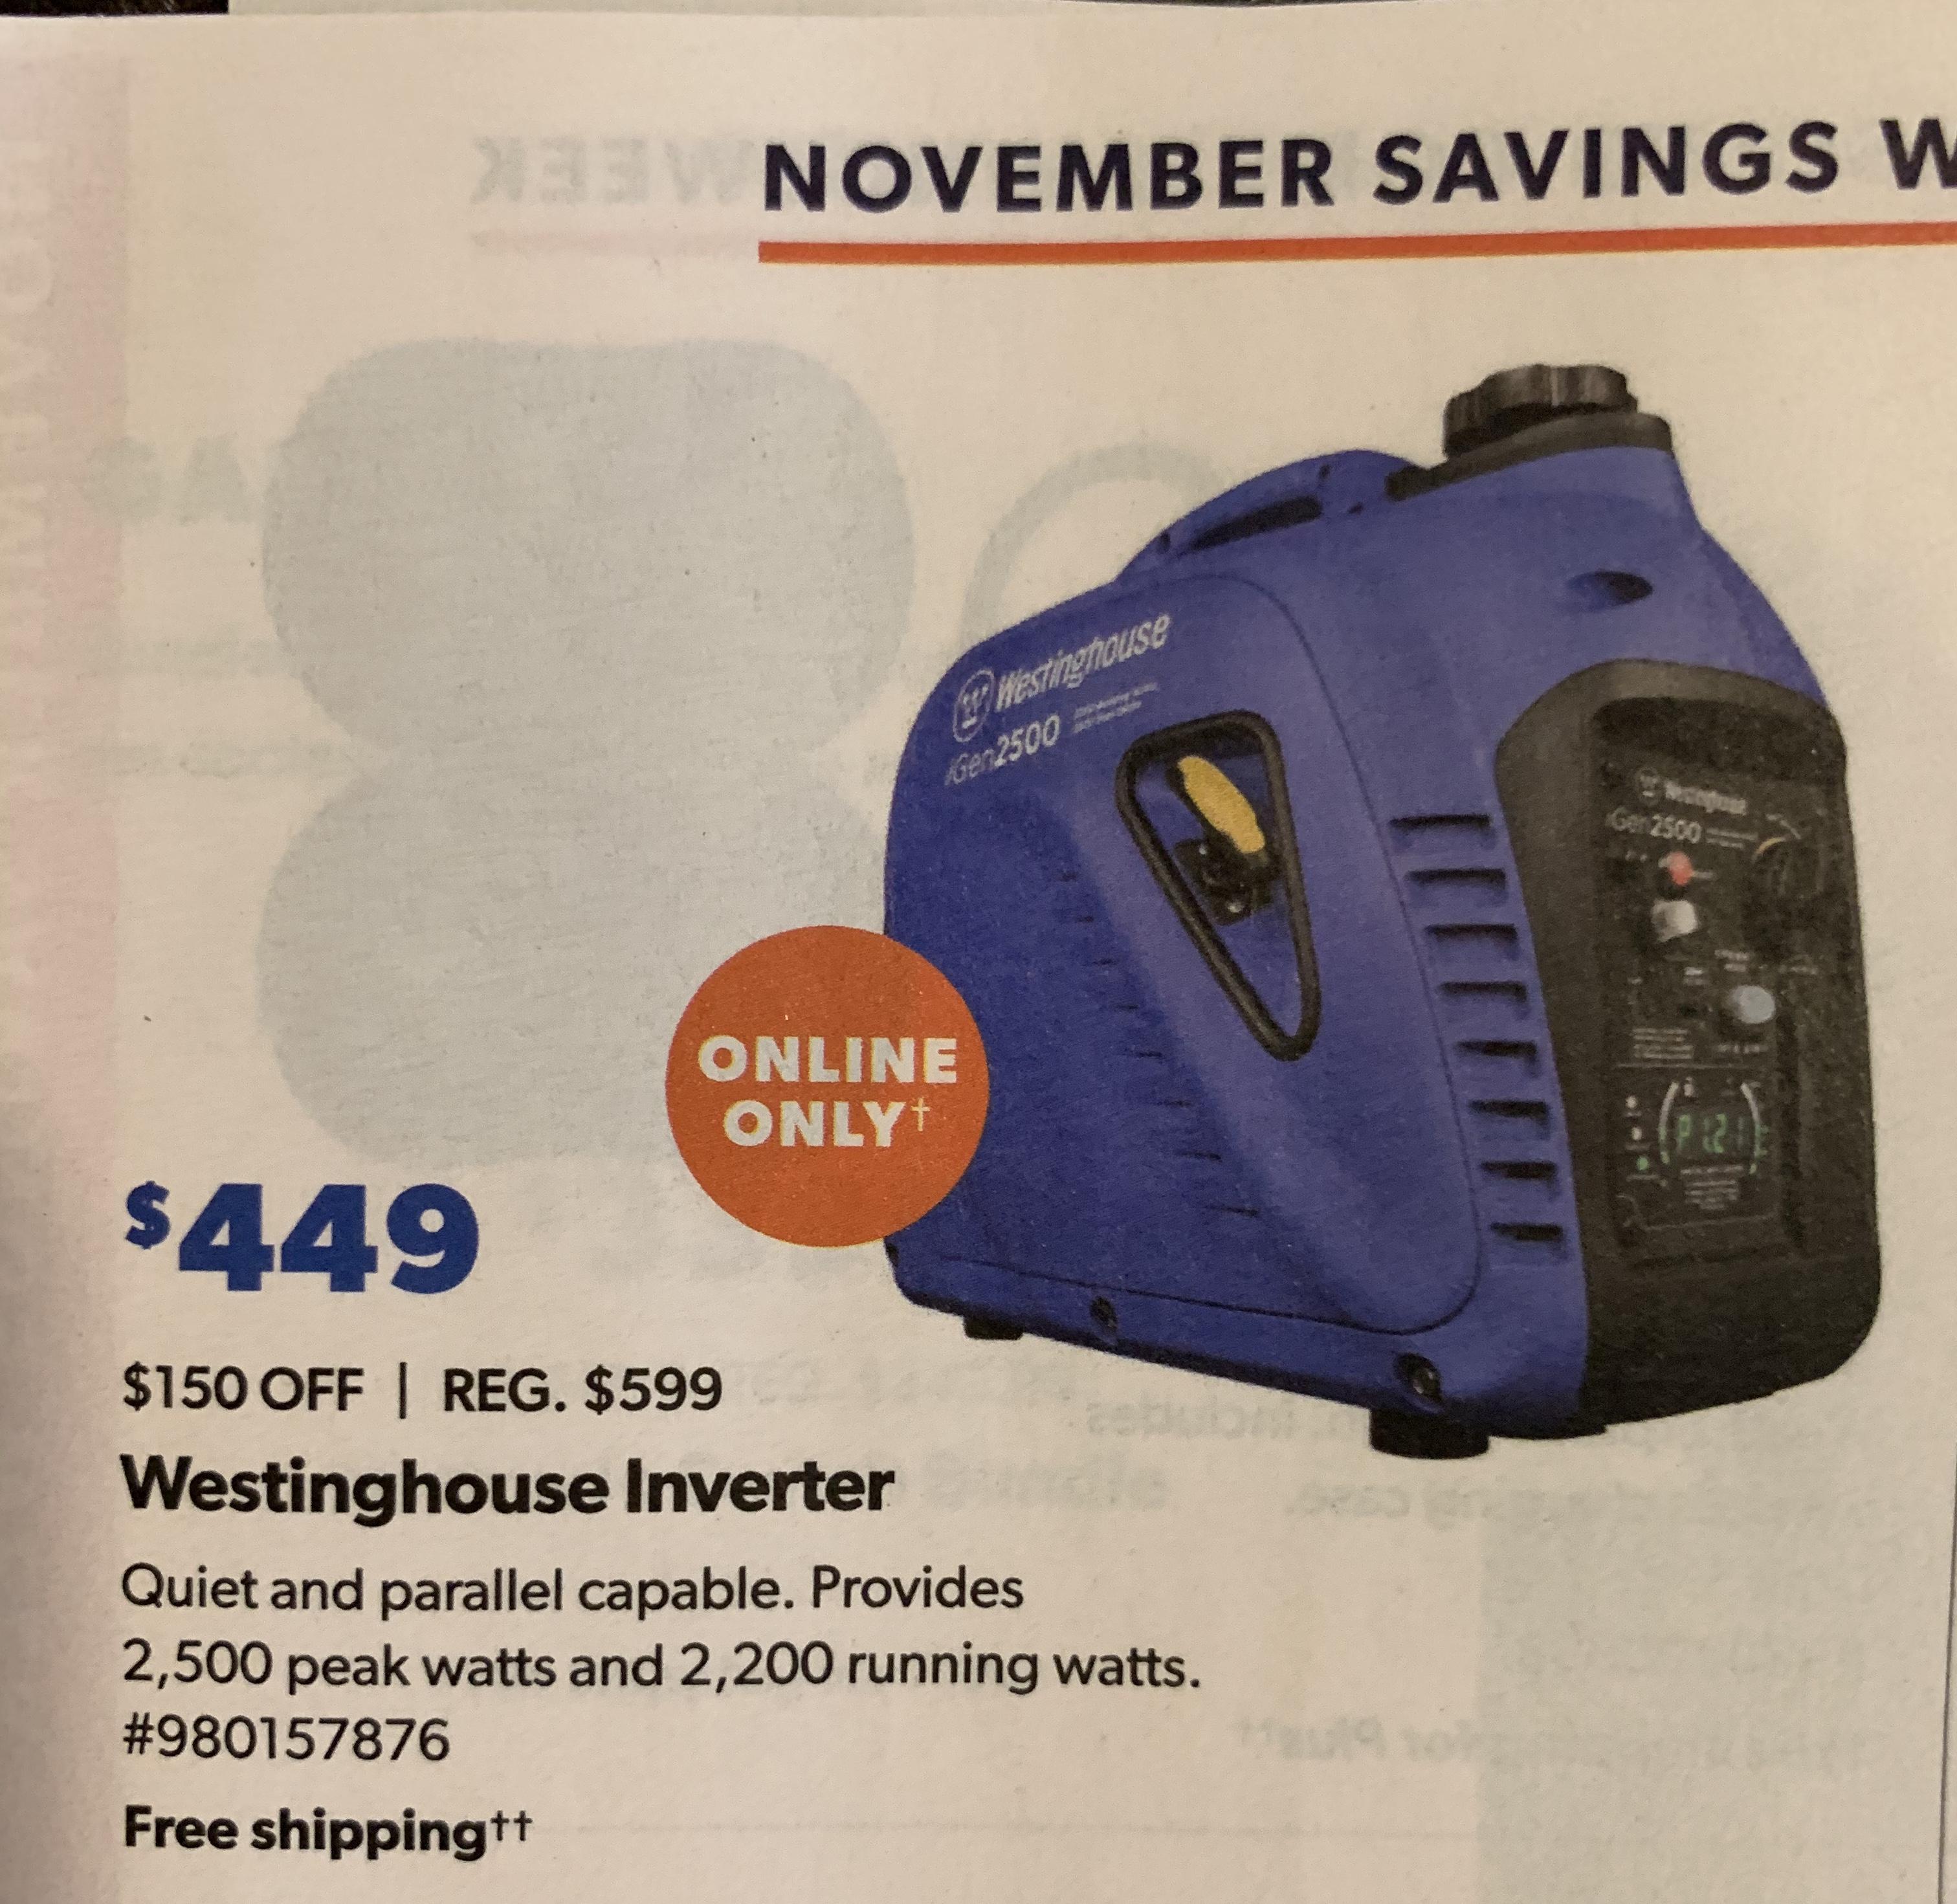 Westinghouse iGen2500 for $449 at Sam's Club